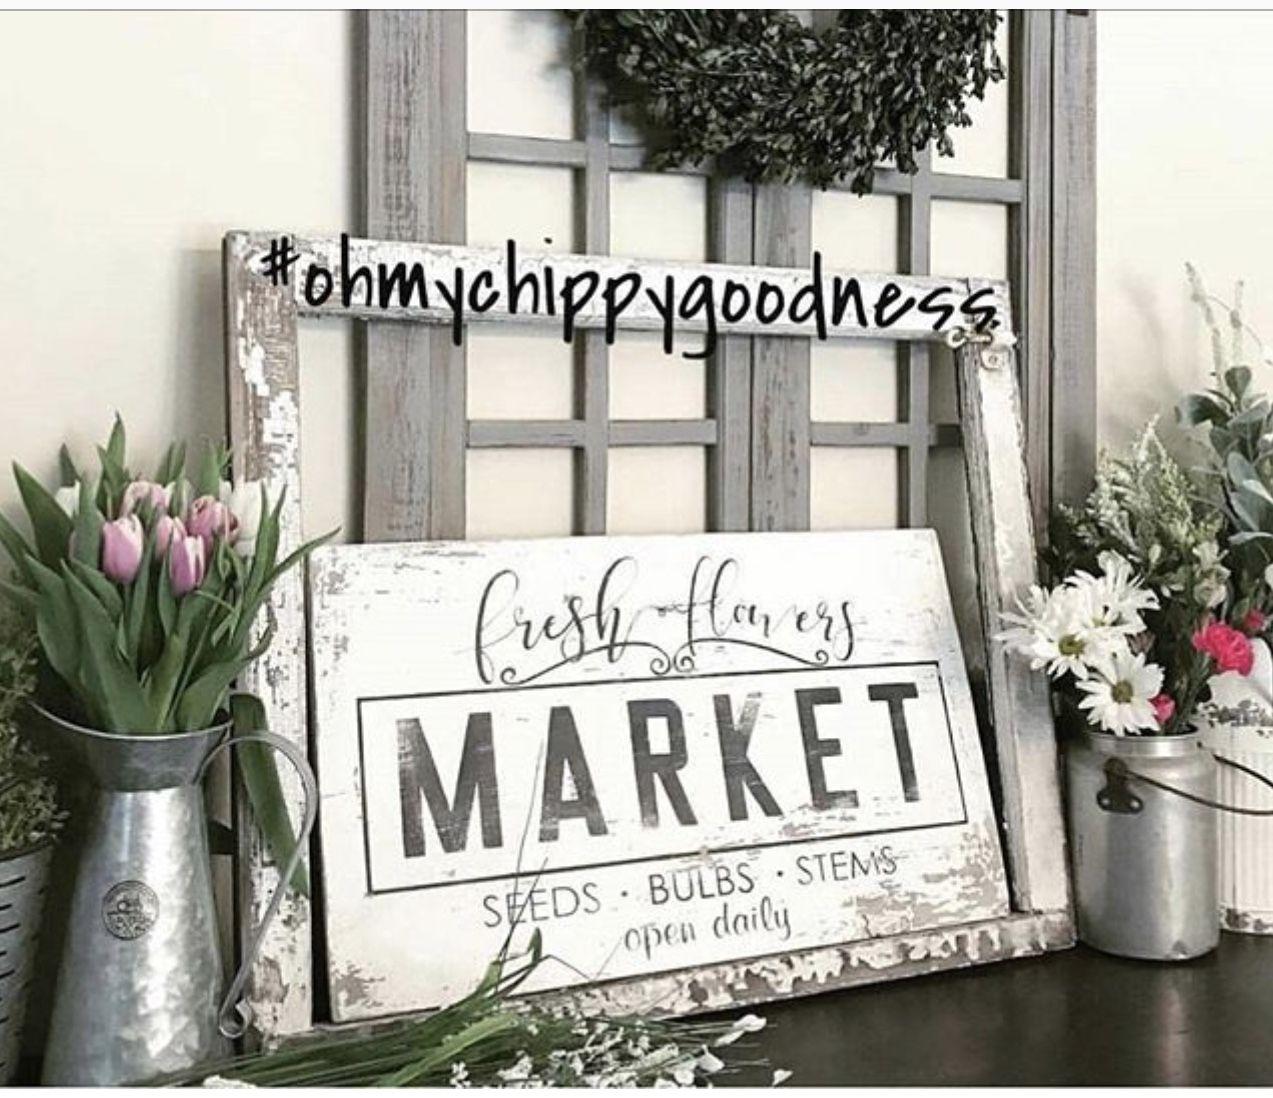 Fresh Market Rudy Lane